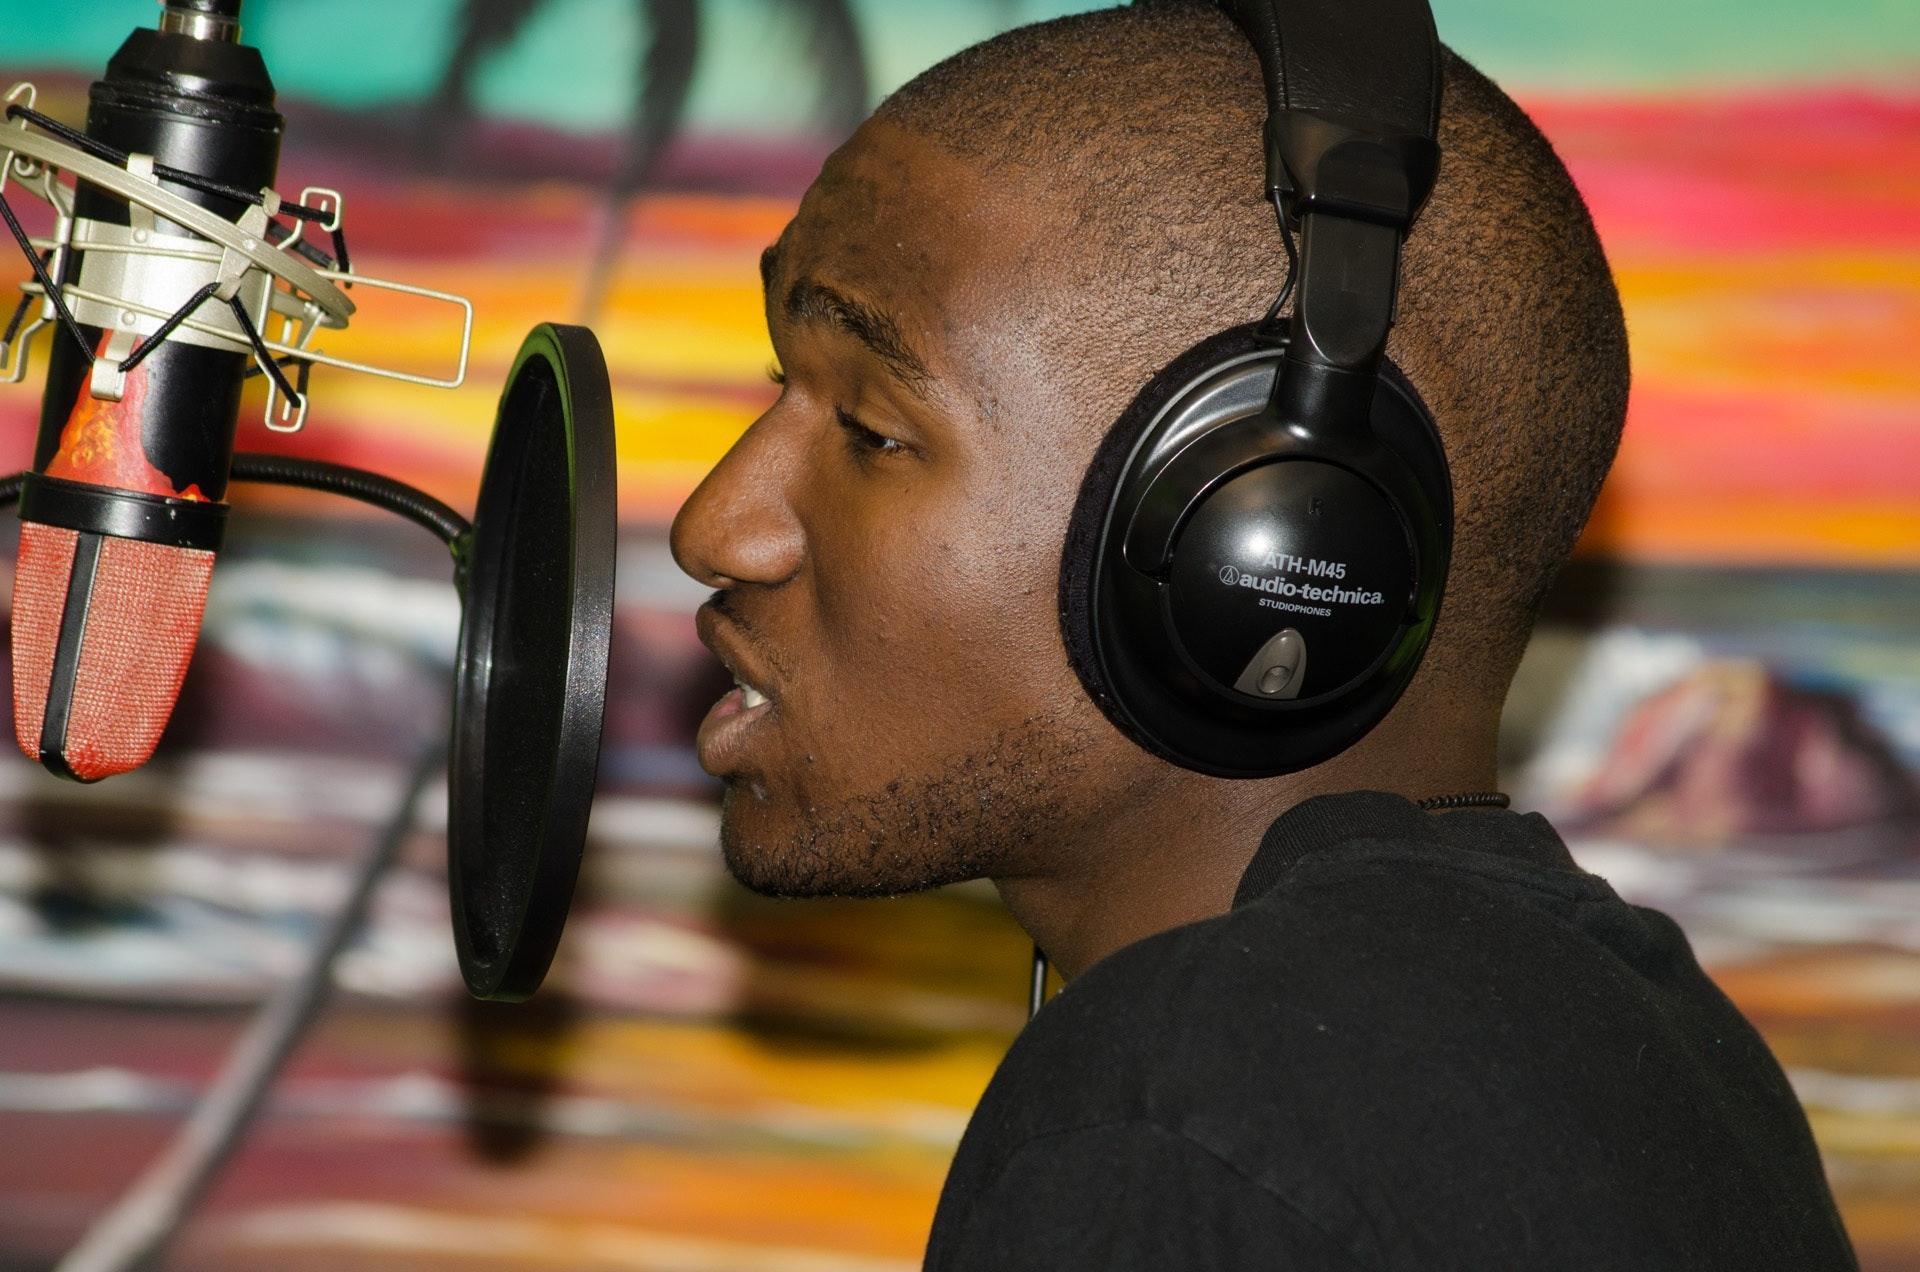 Man in black tops wearing black headphones singing in front of black condenser microphone photo